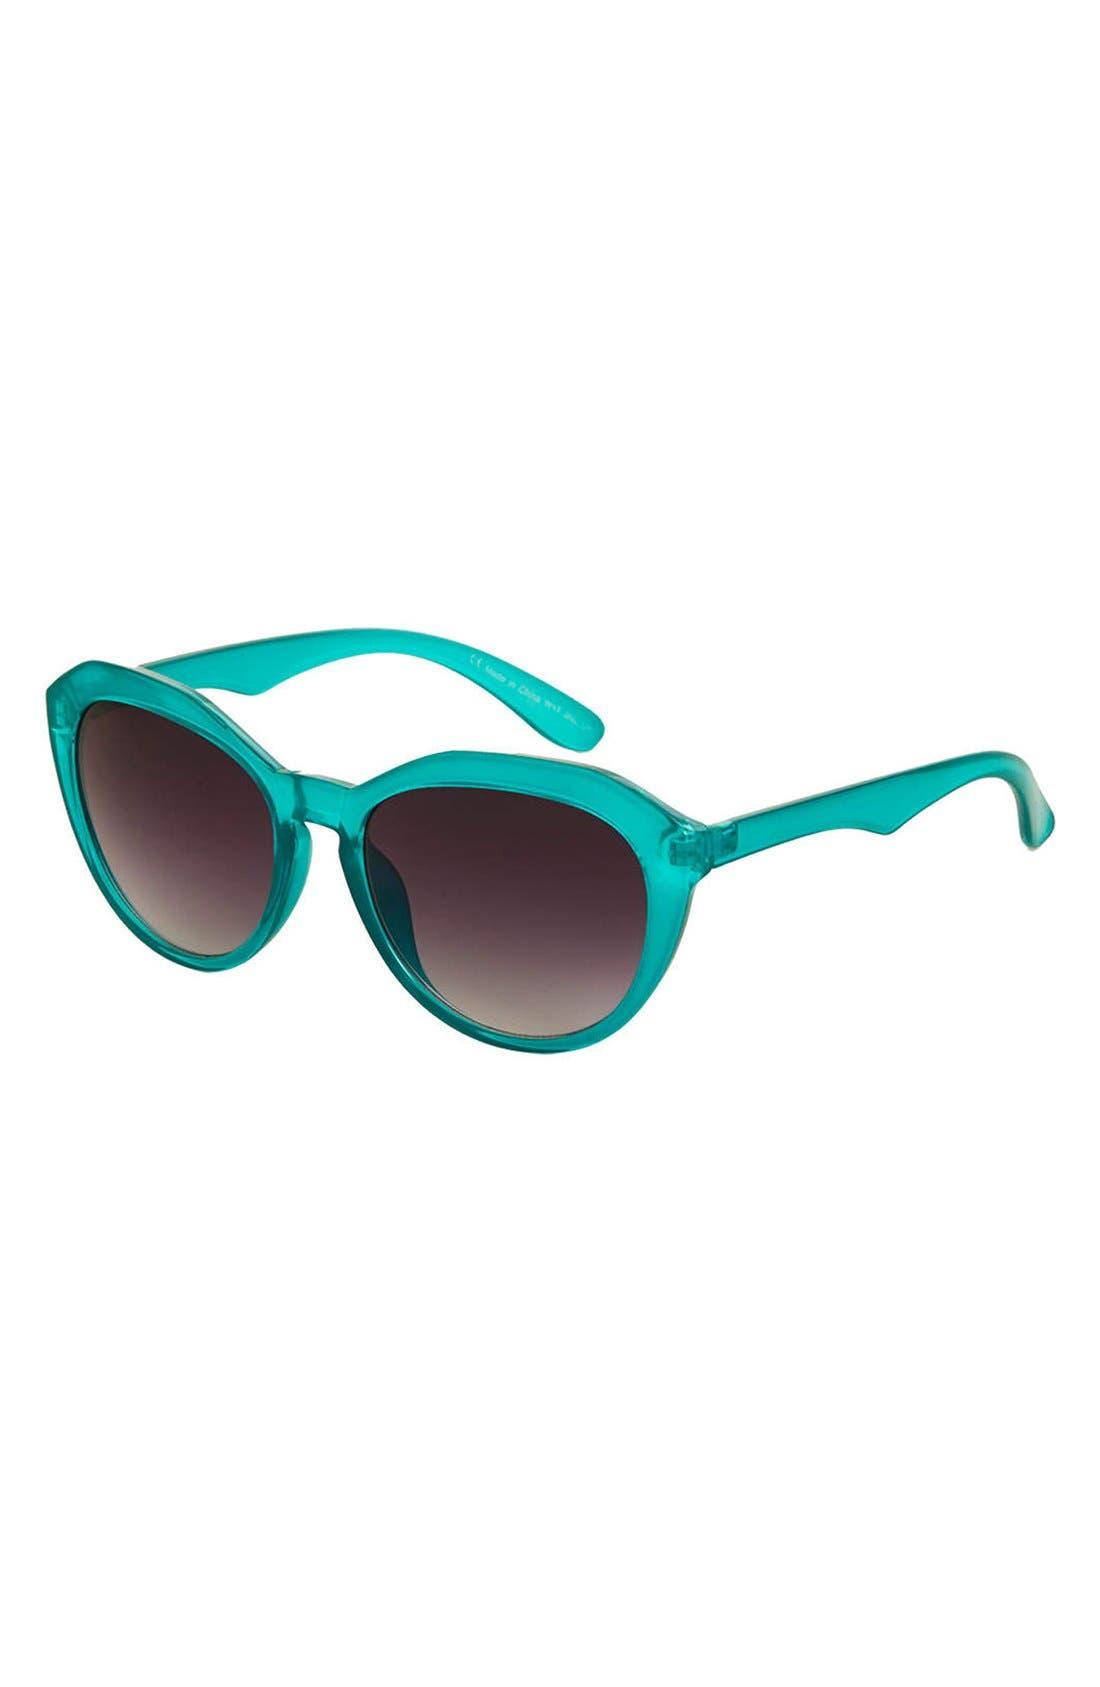 Main Image - Topshop 'Serene' 50mm Cat Eye Sunglasses